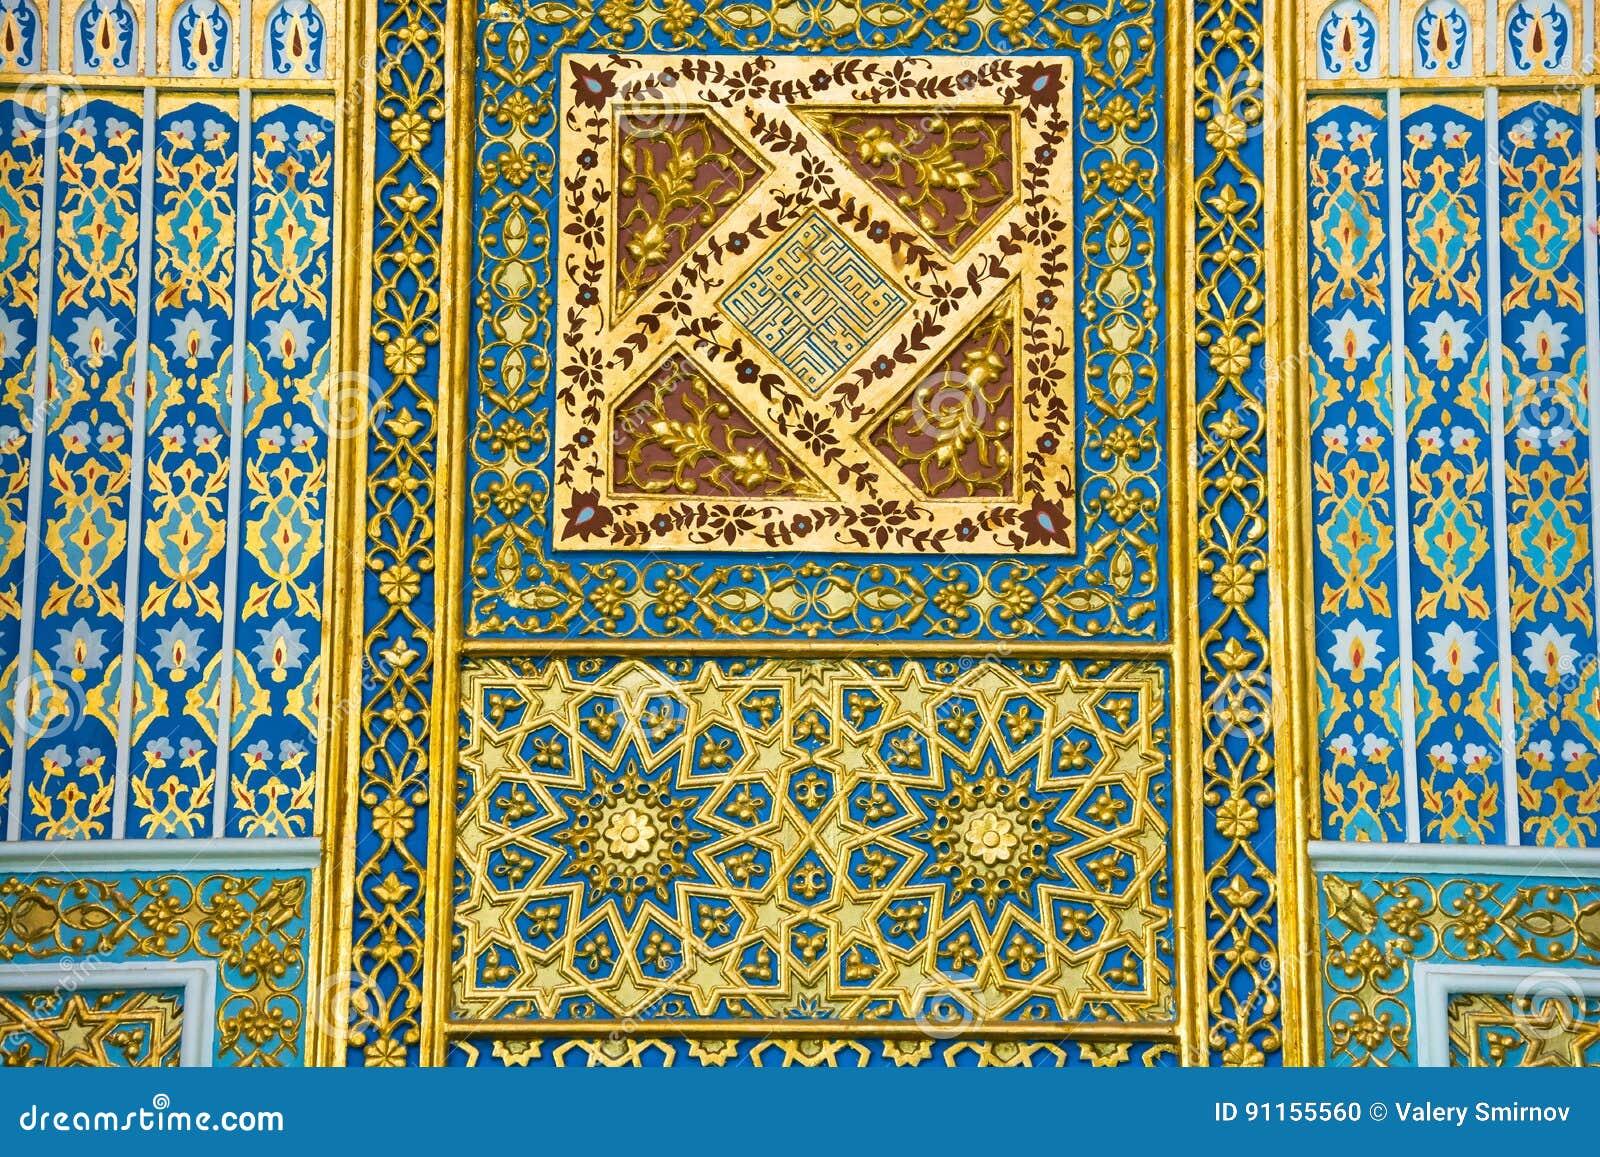 Mezquita de menor importancia de los modelos caligráficos en Tashkent, Uzbekistán